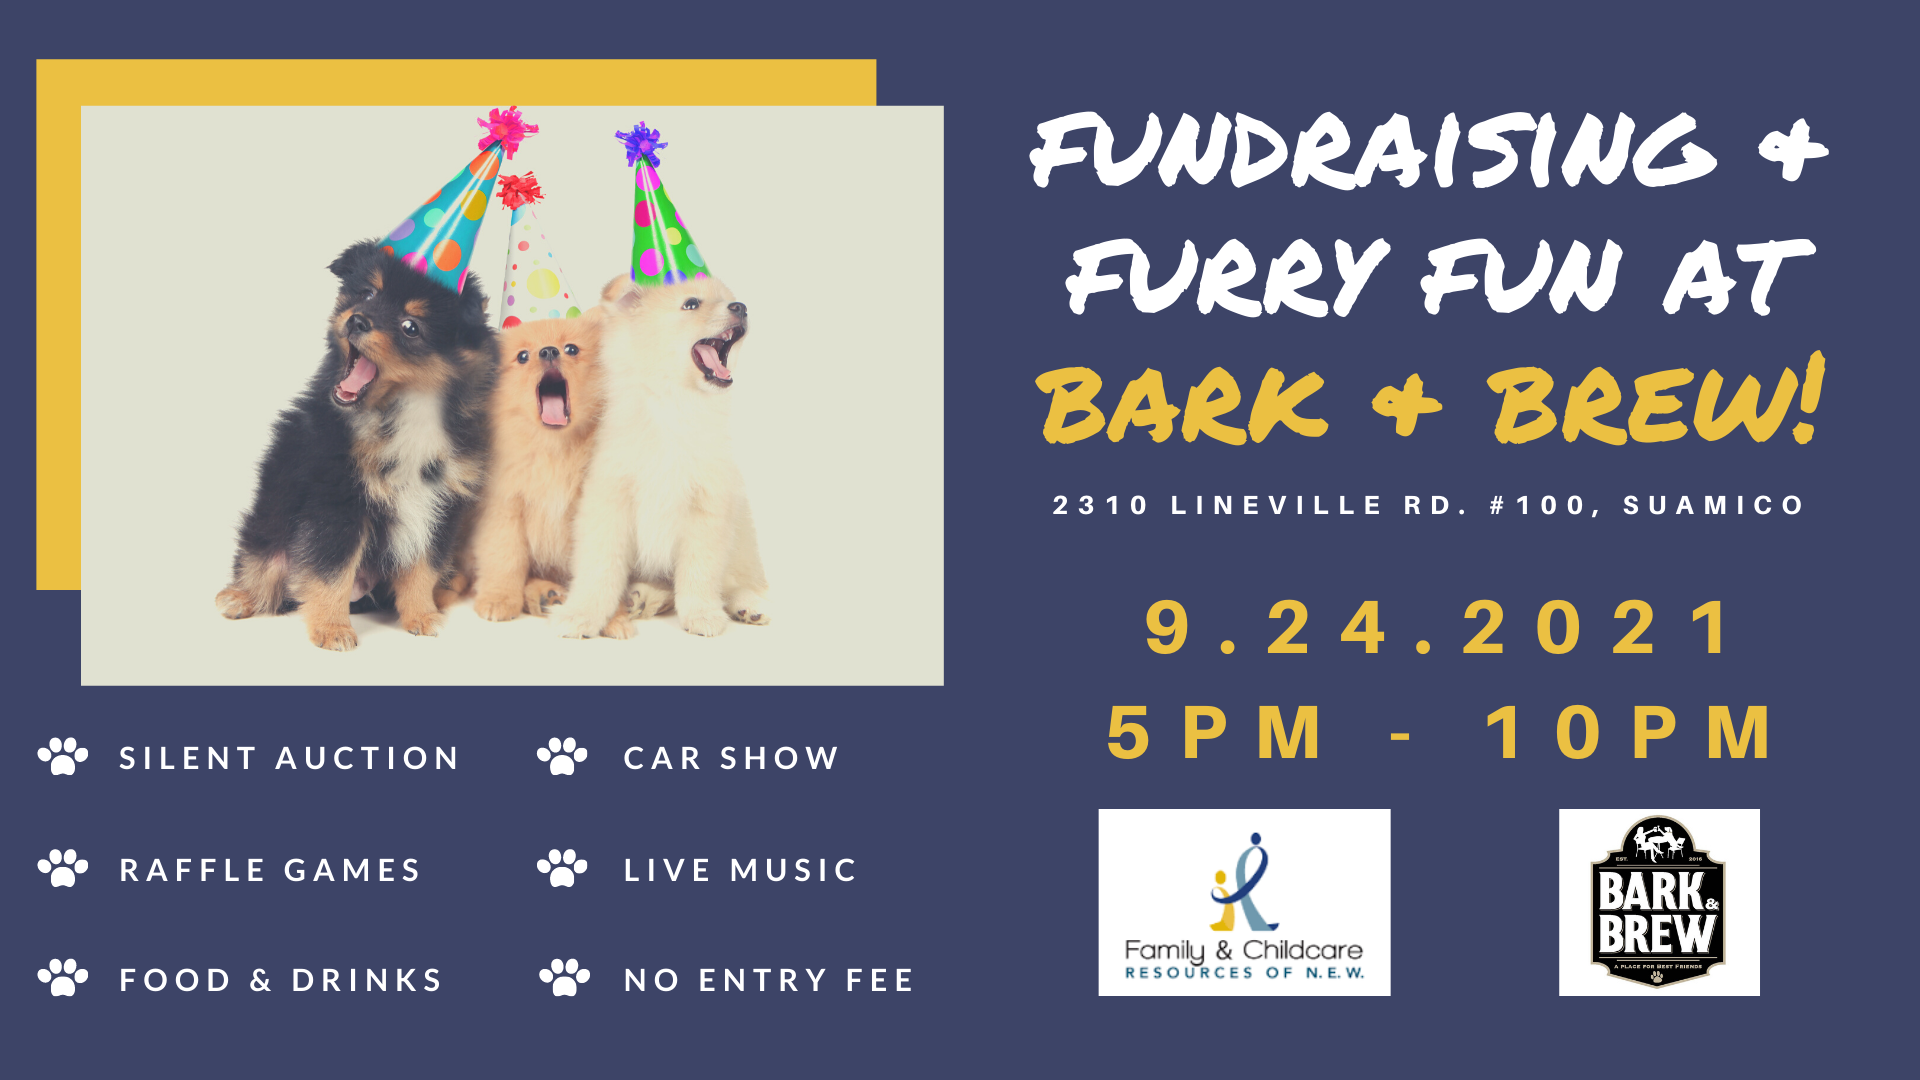 FCRNEW's Fundraiser at Bark & Brew